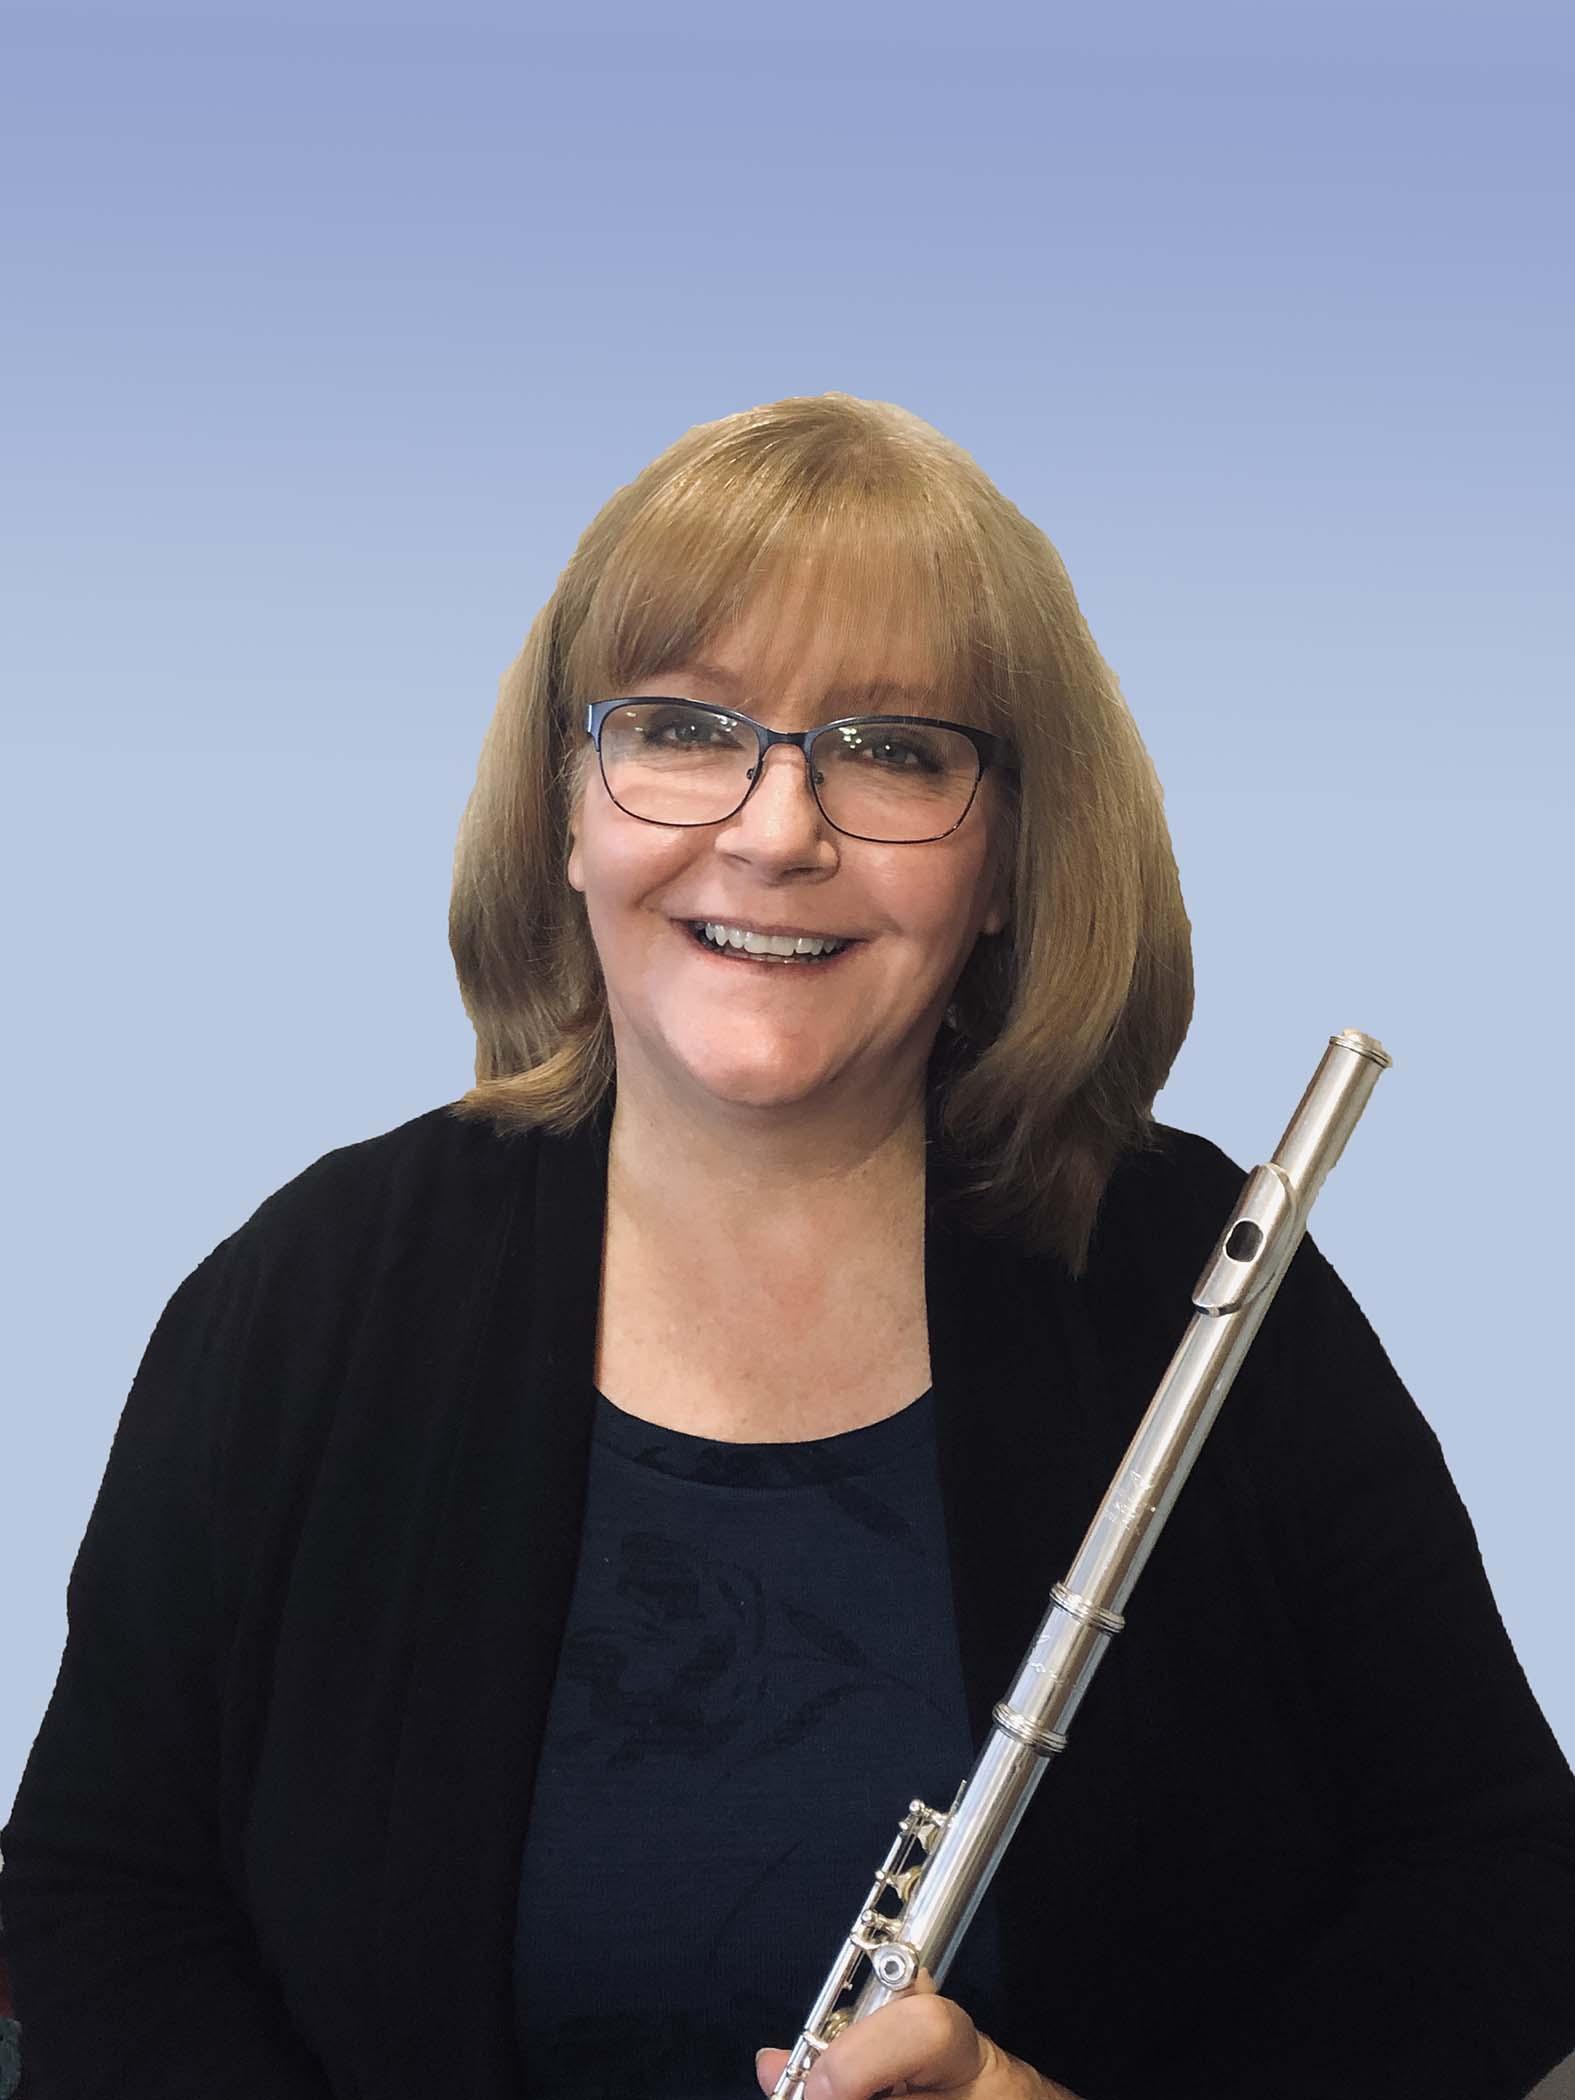 Susan Hallstead